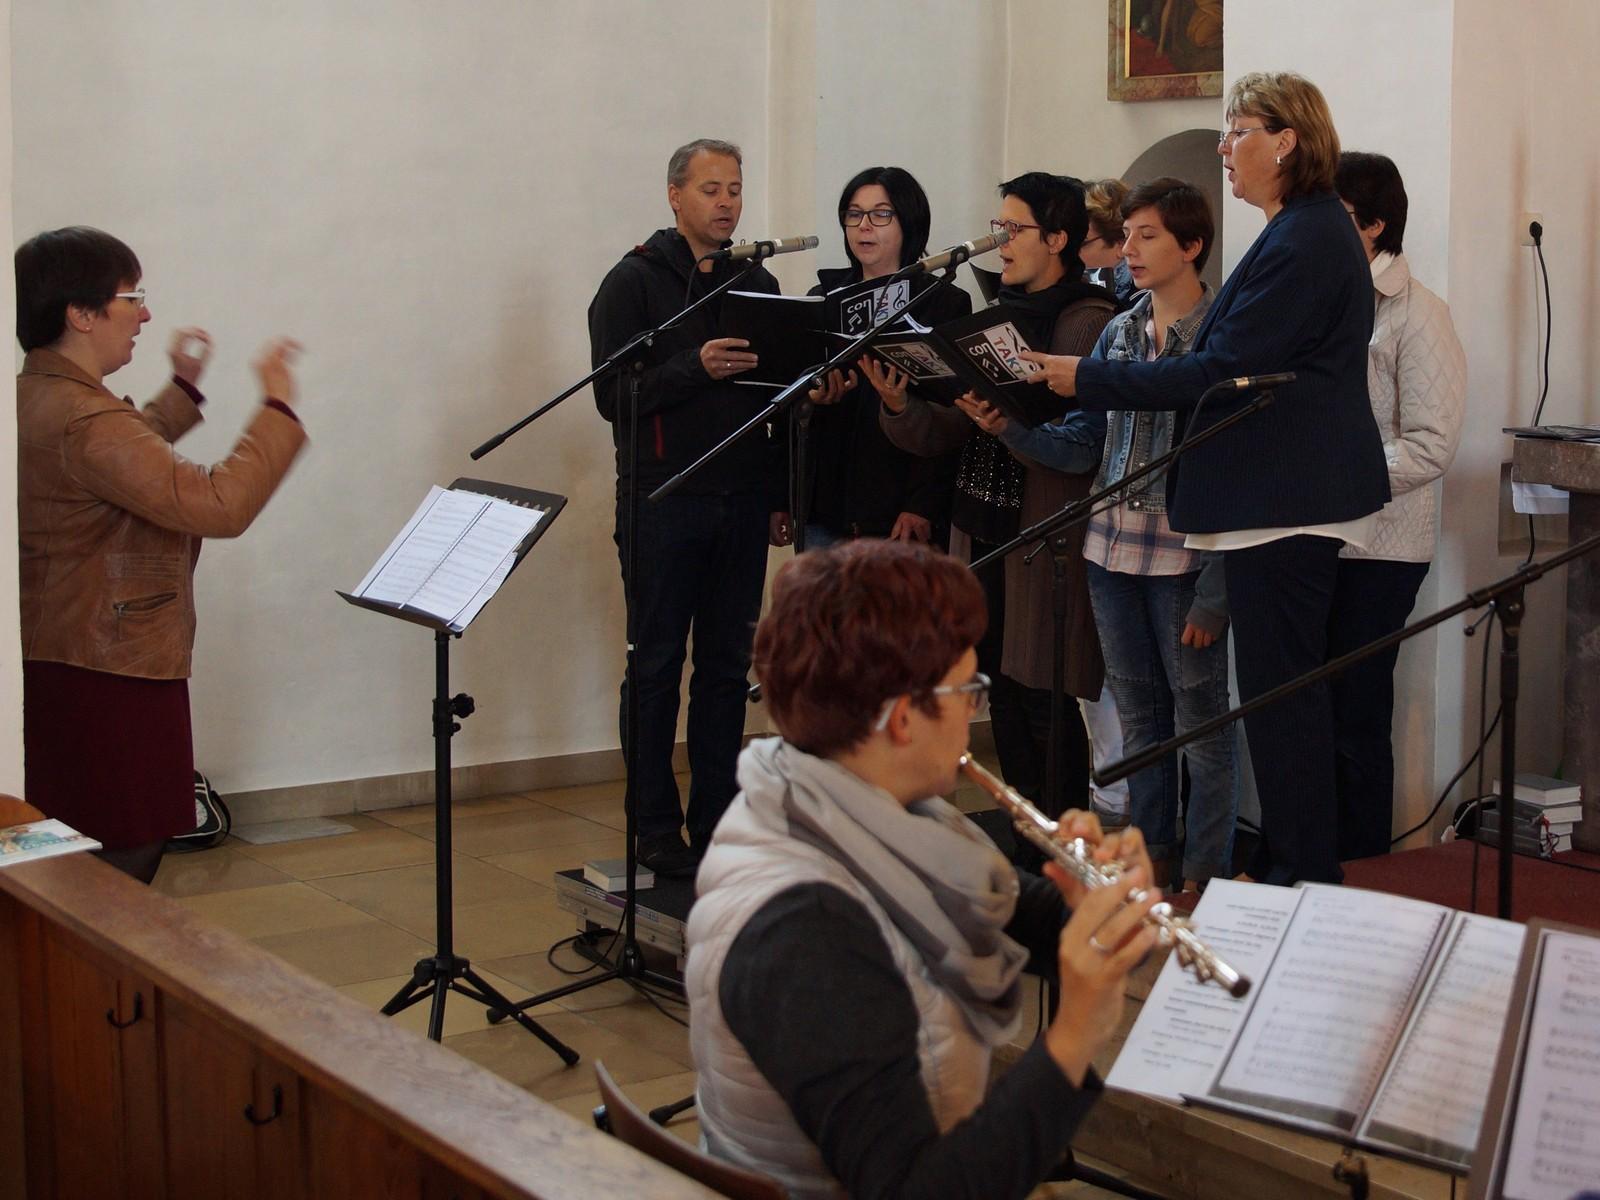 20180930-Erntedank Pfarrei Schwarzenfeld mit Gruppen Piccolo und ContactDSC03434